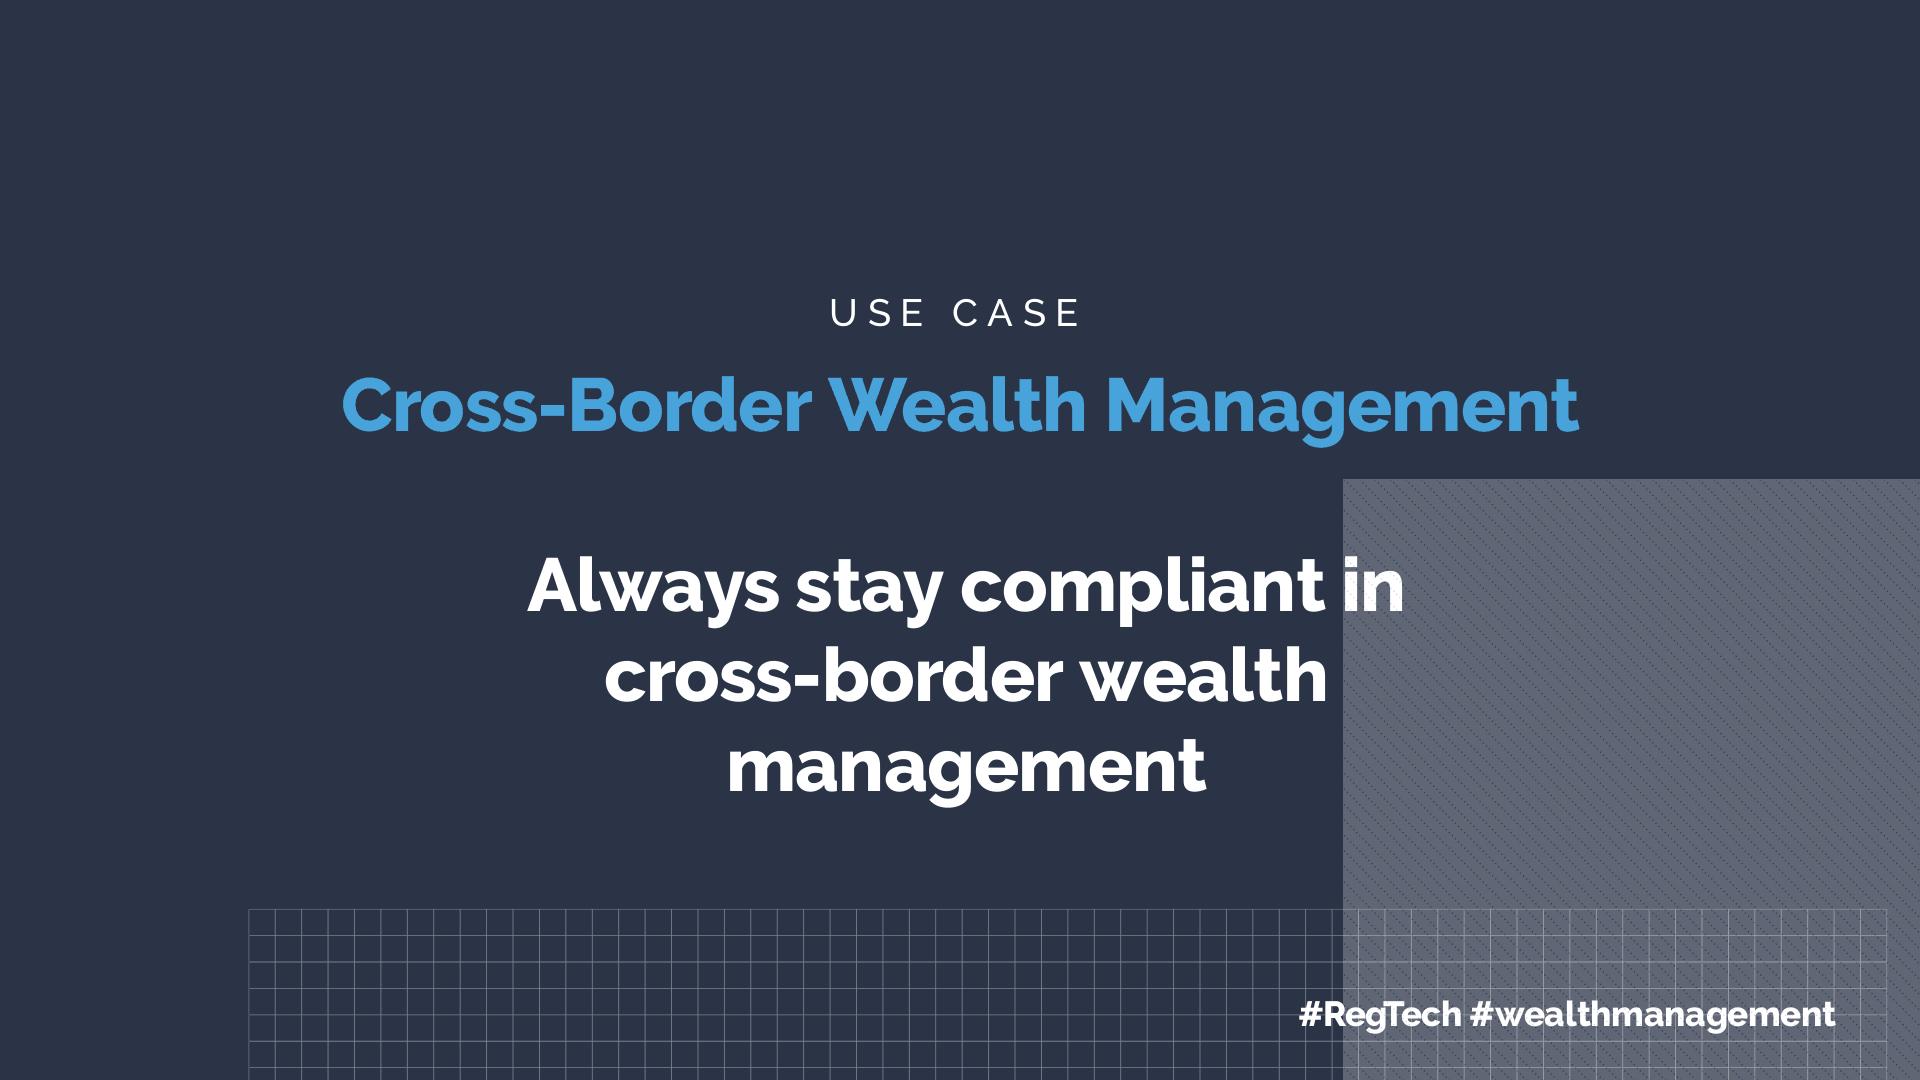 Cross-Border Wealth Management